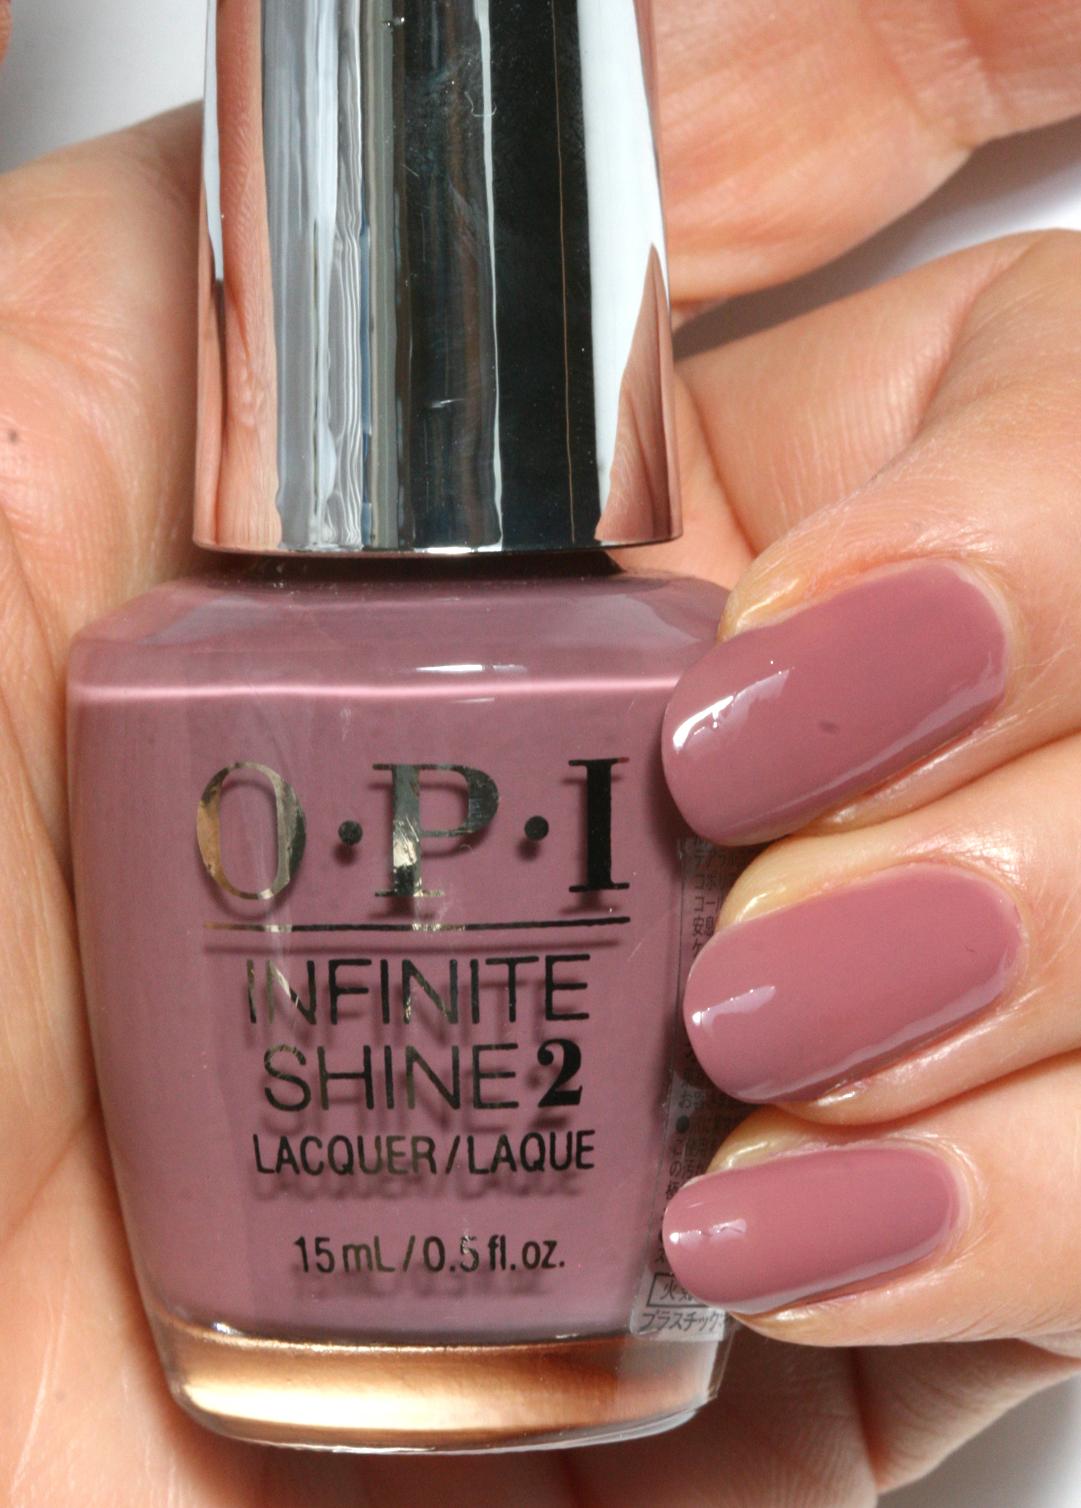 OPI INFINITE SHINE(インフィニット シャイン) IS-L57 You Sustain Me (ユー サステイン ミー)